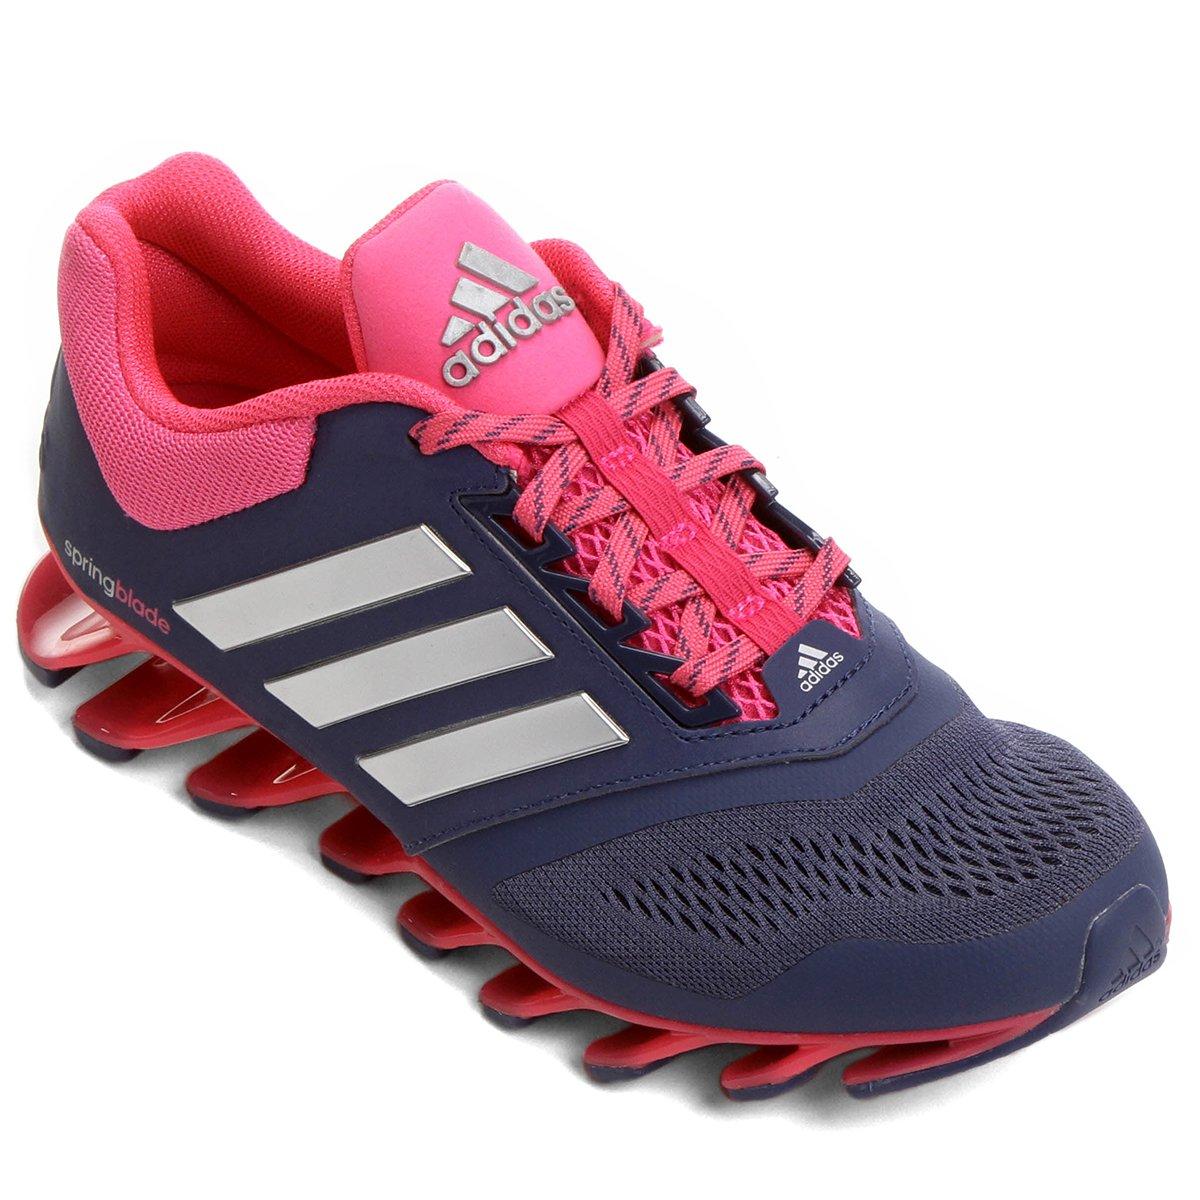 regarder 23c27 e7ae8 where to buy adidas springblade 3 masculino 9441b 515dd